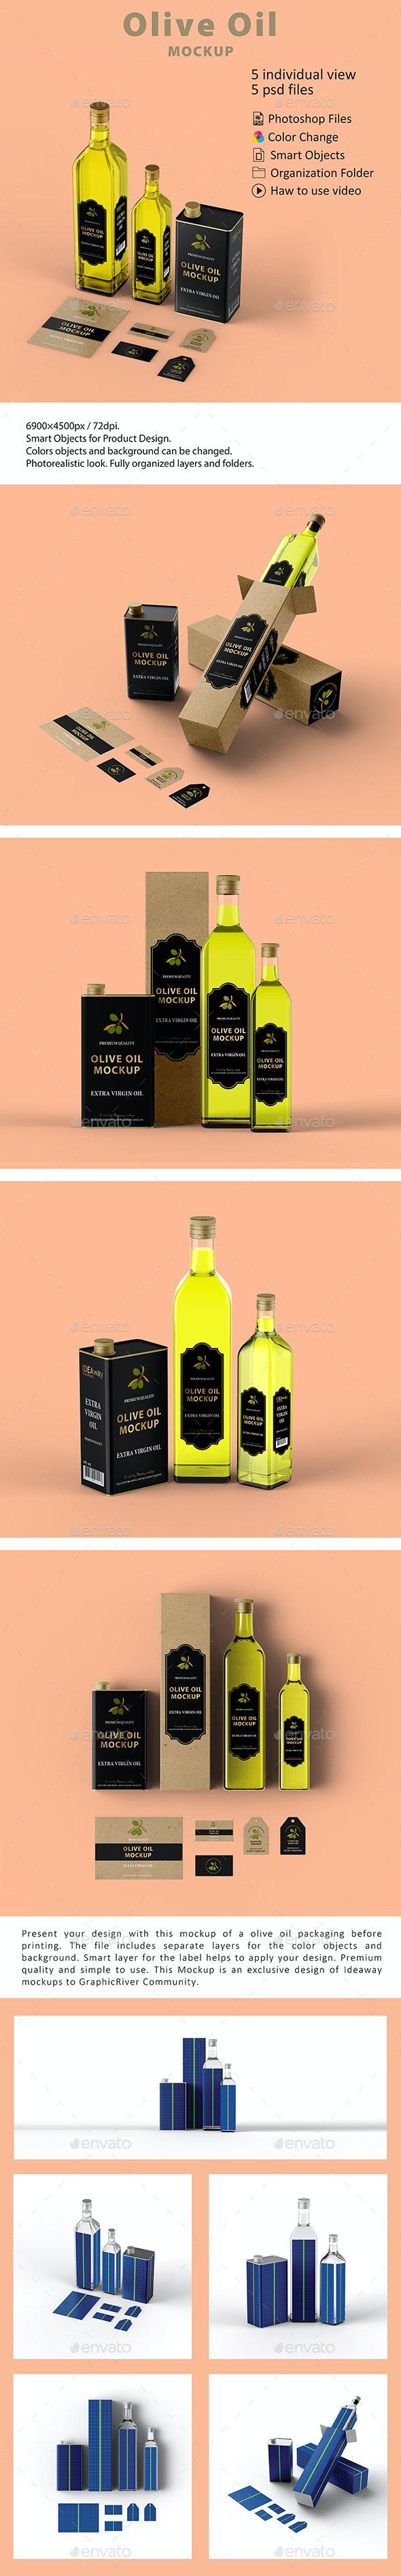 Olive Oil Packaging Mockup - Food and Drink Packaging